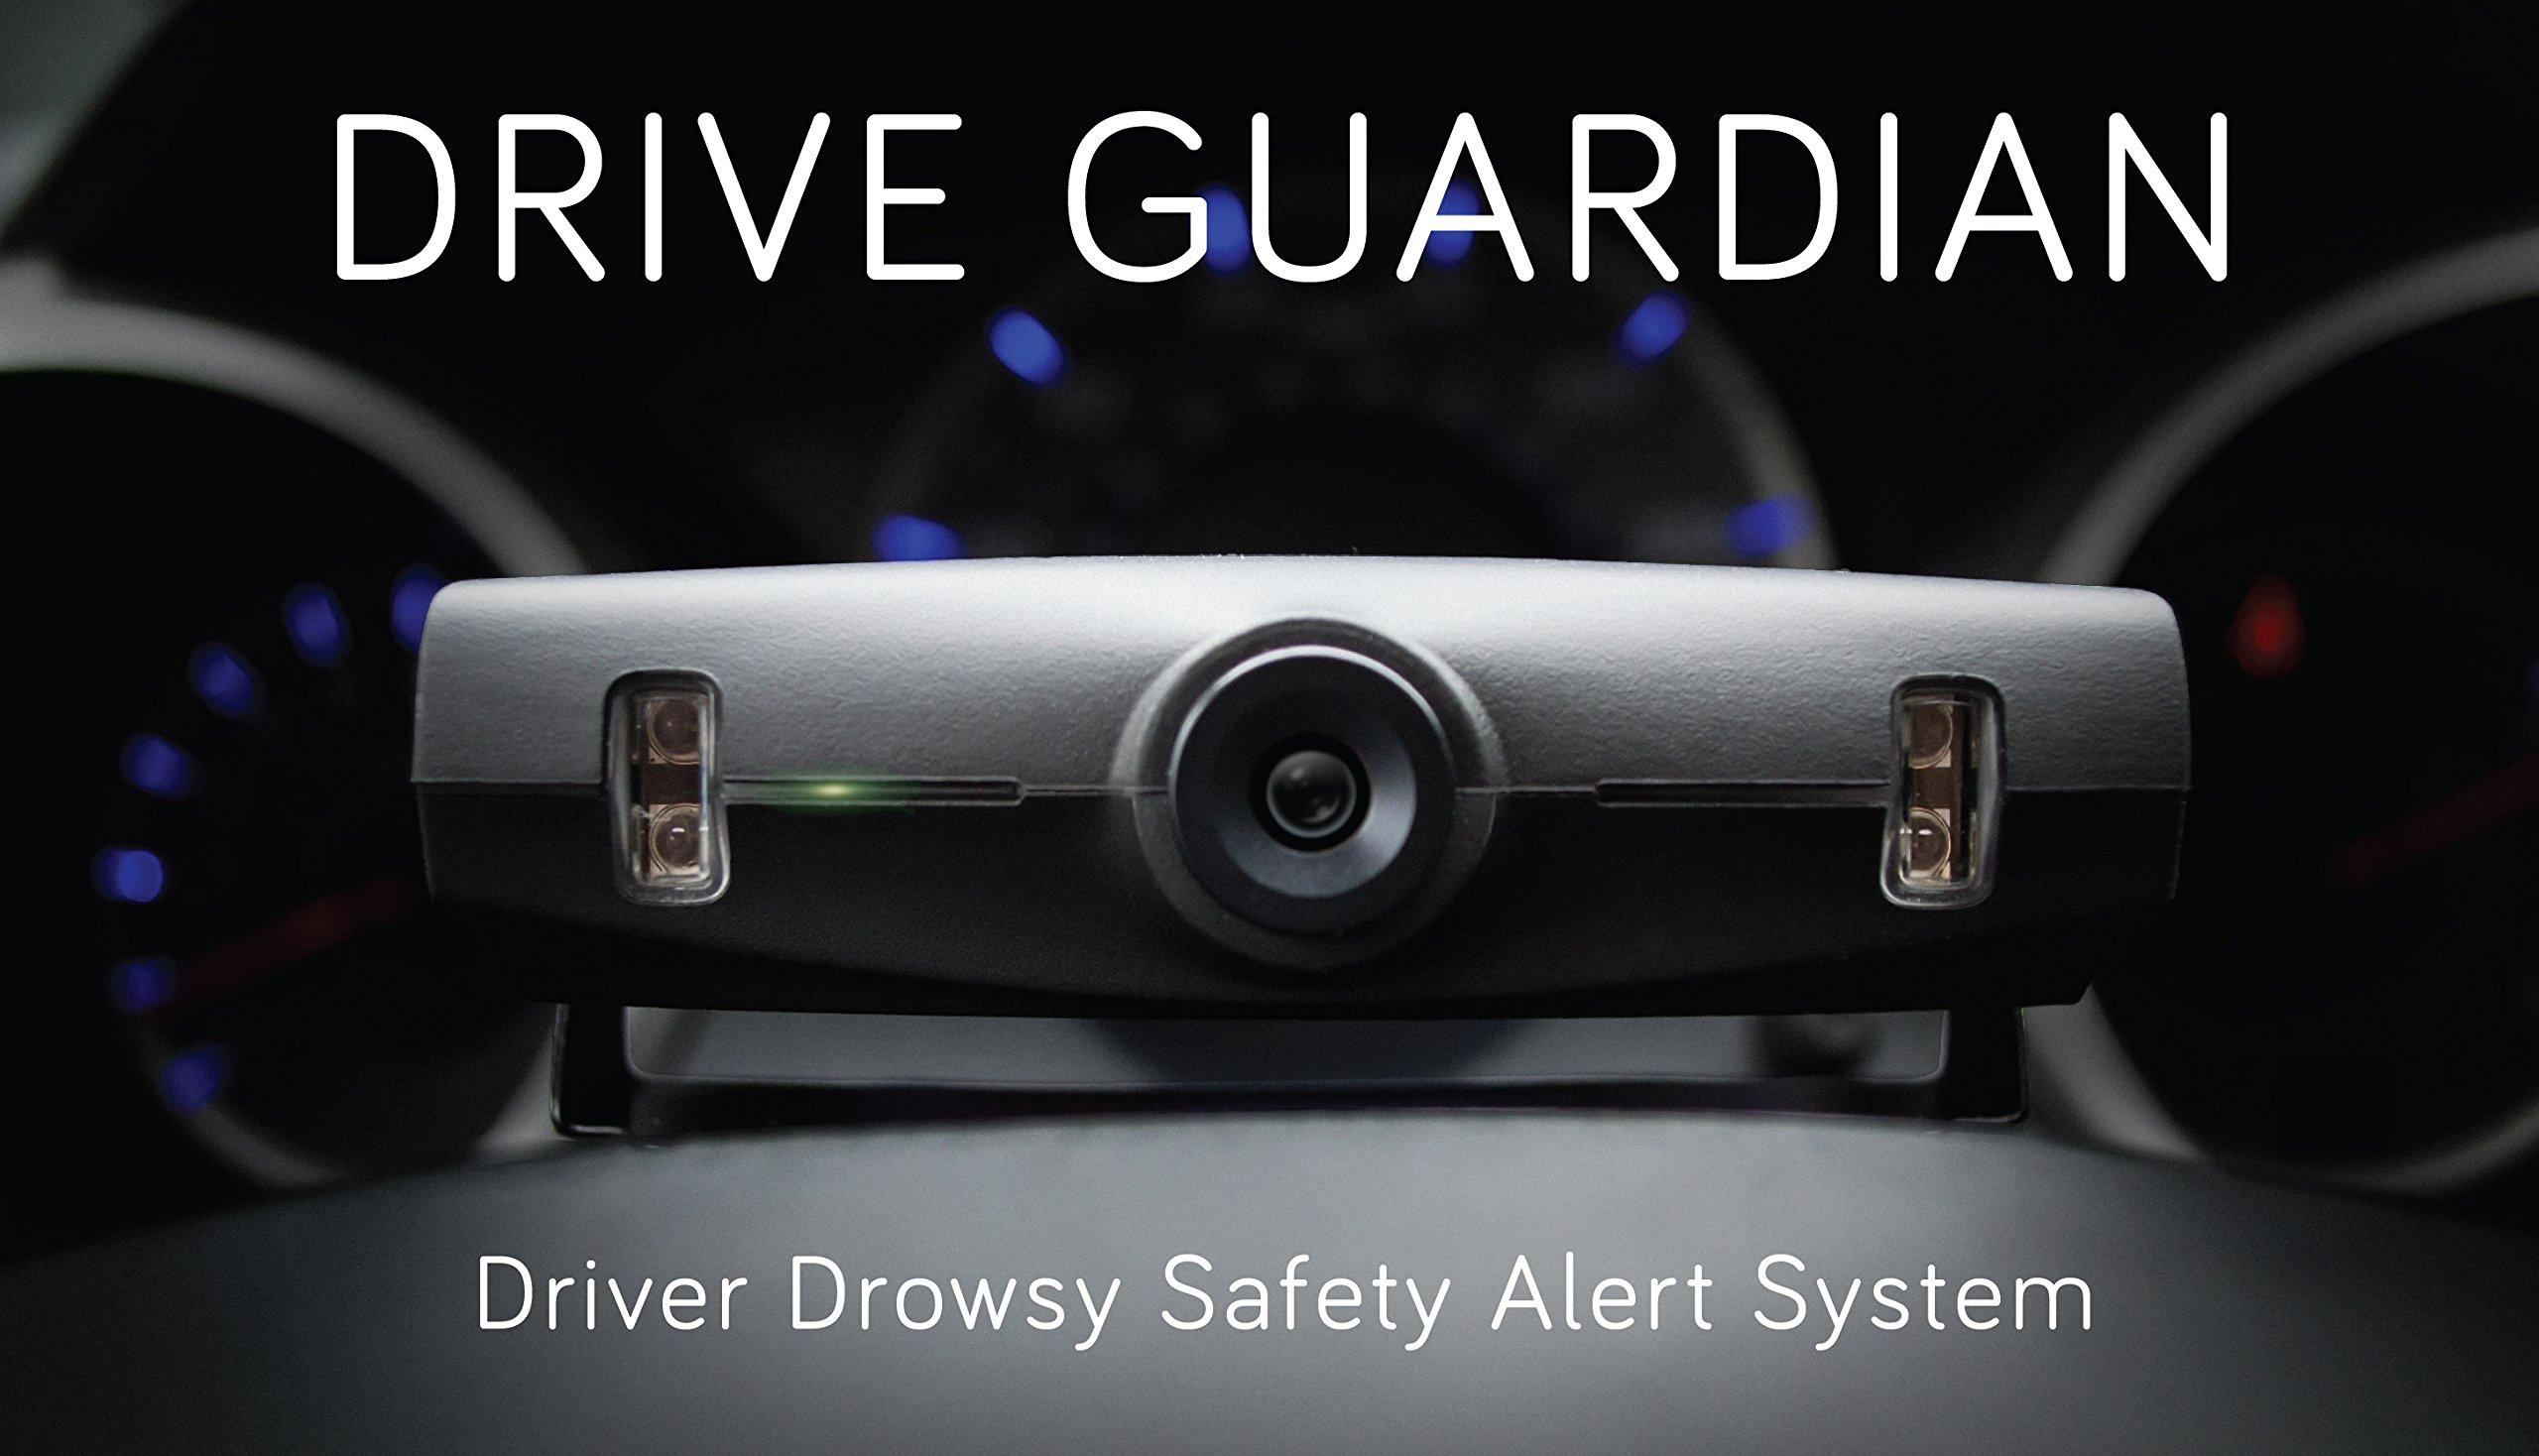 Timetec Drive Guardian CM-DW100 Driver drowsy warning system